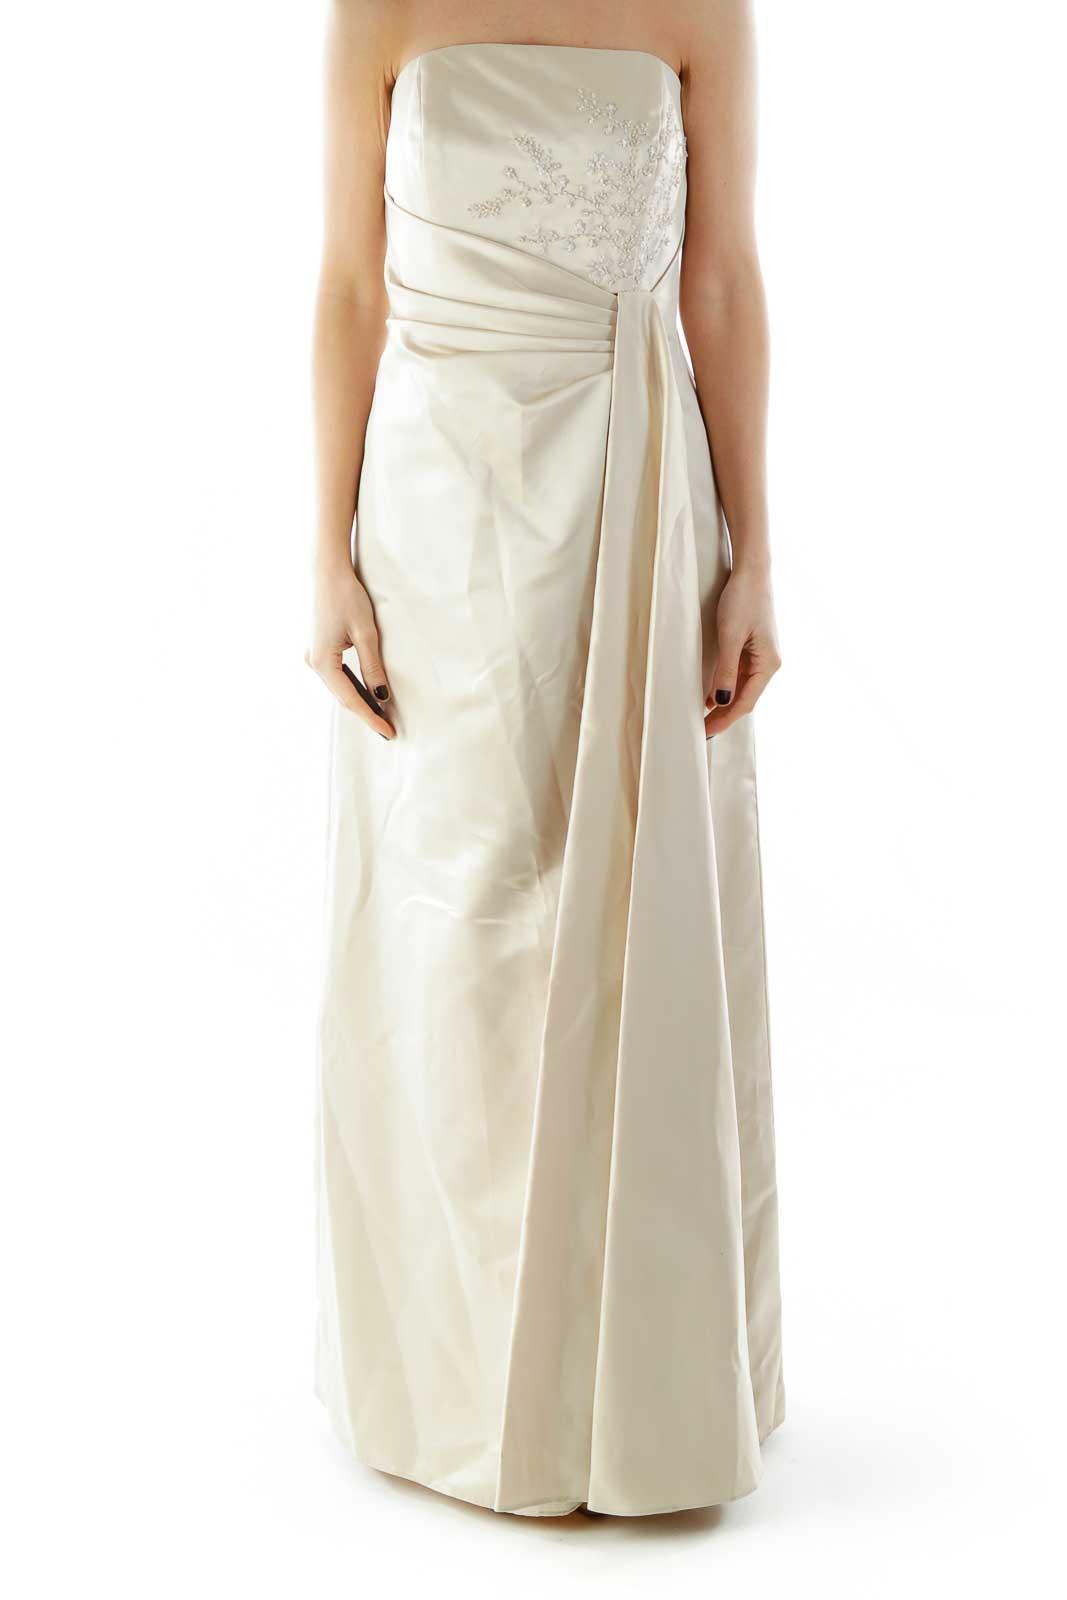 Beige Strapless Beaded Dress Front